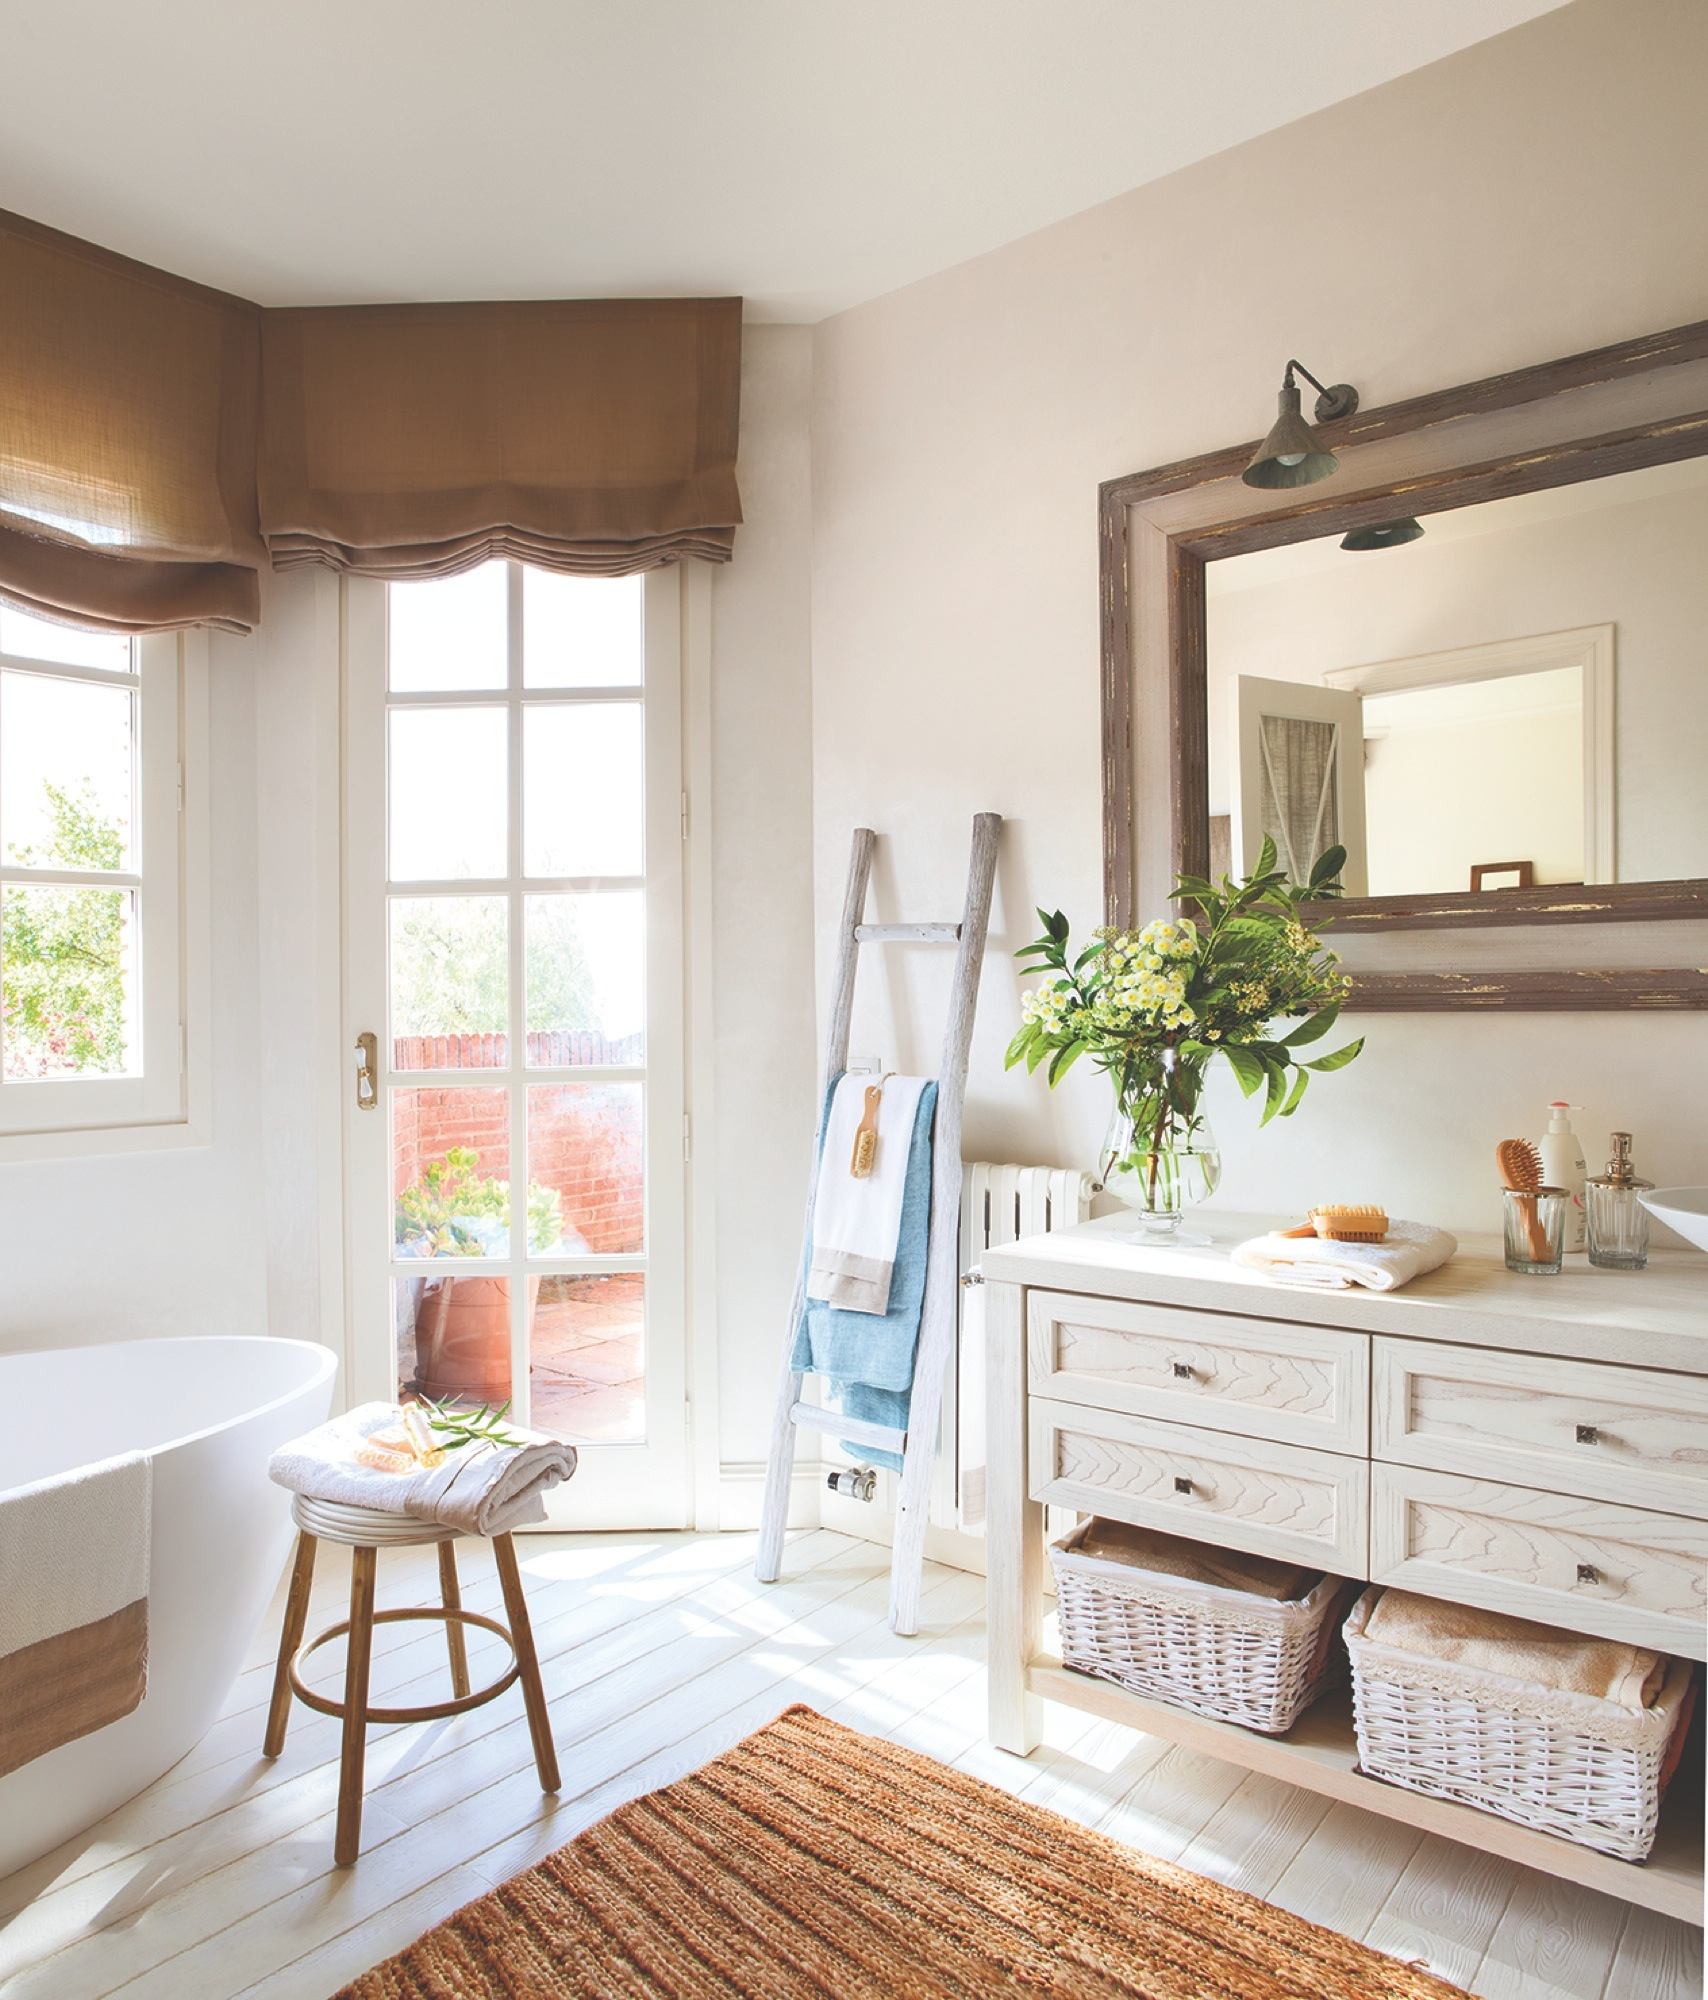 fotos de ideas de azulejos de bañera 10 Baos Espectaculares Con 30 Ideas Muy Prcticas